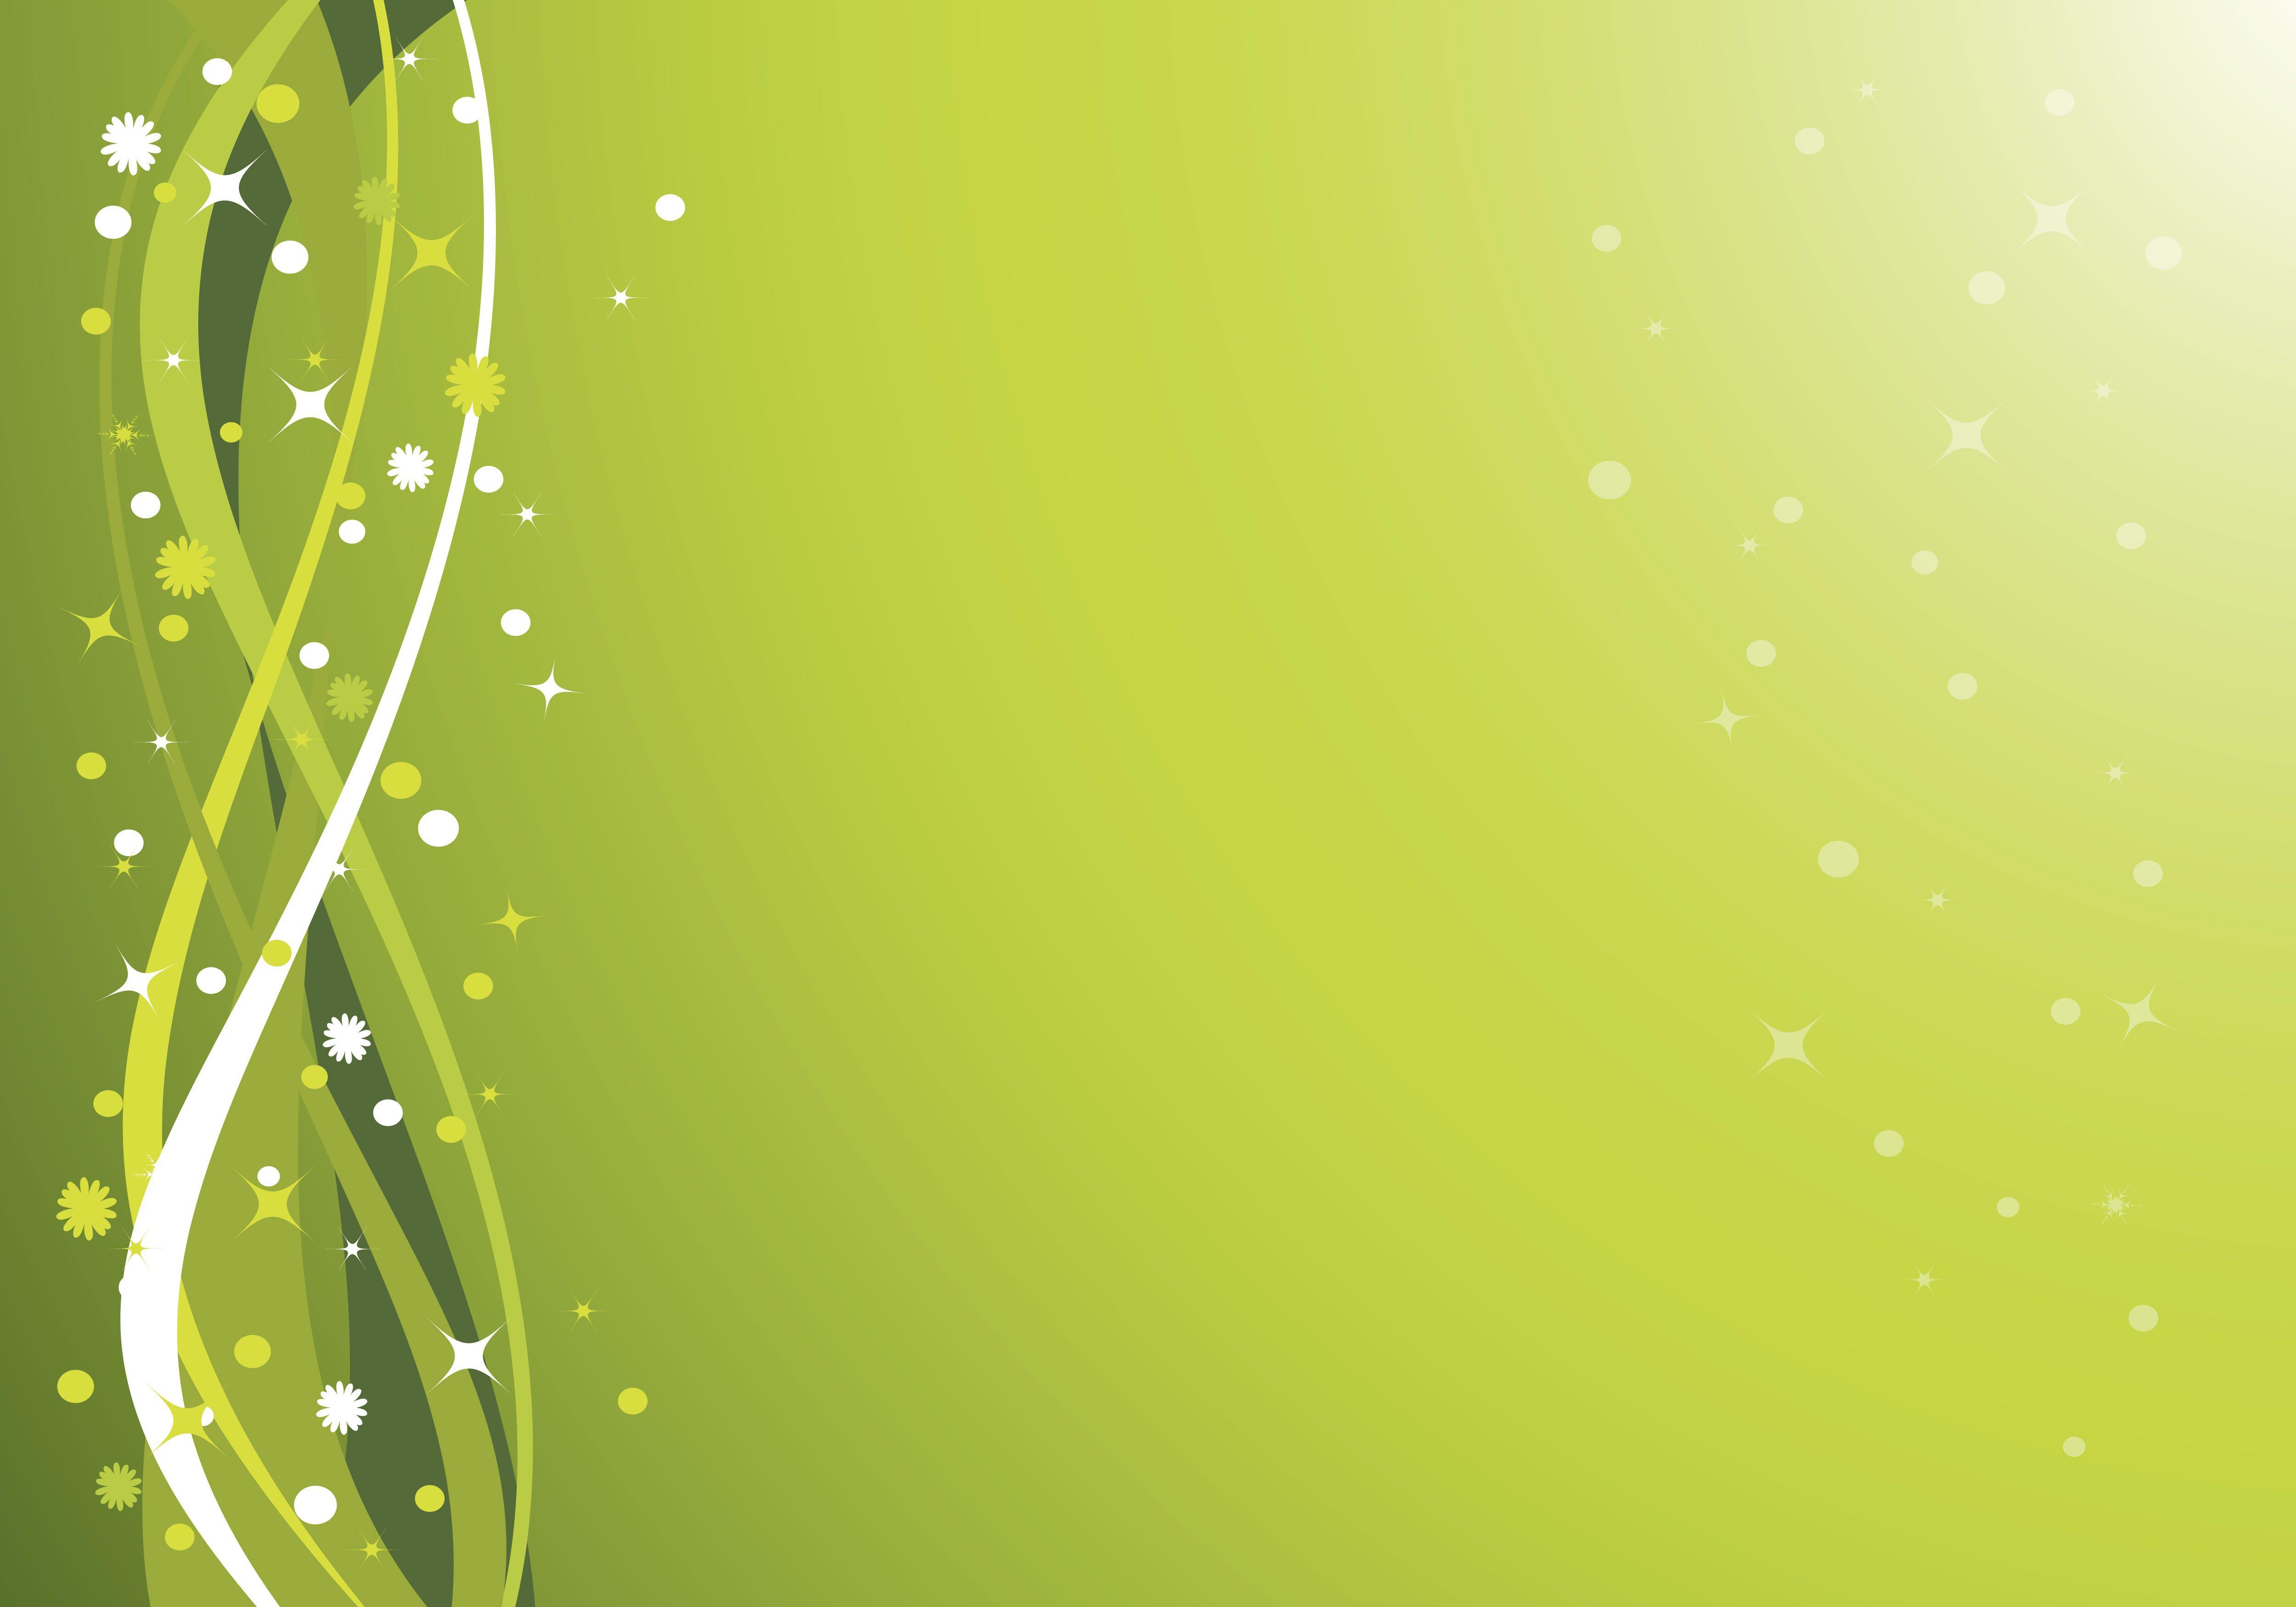 7 Green Background Vector Free Vector 4vector Backgrounds